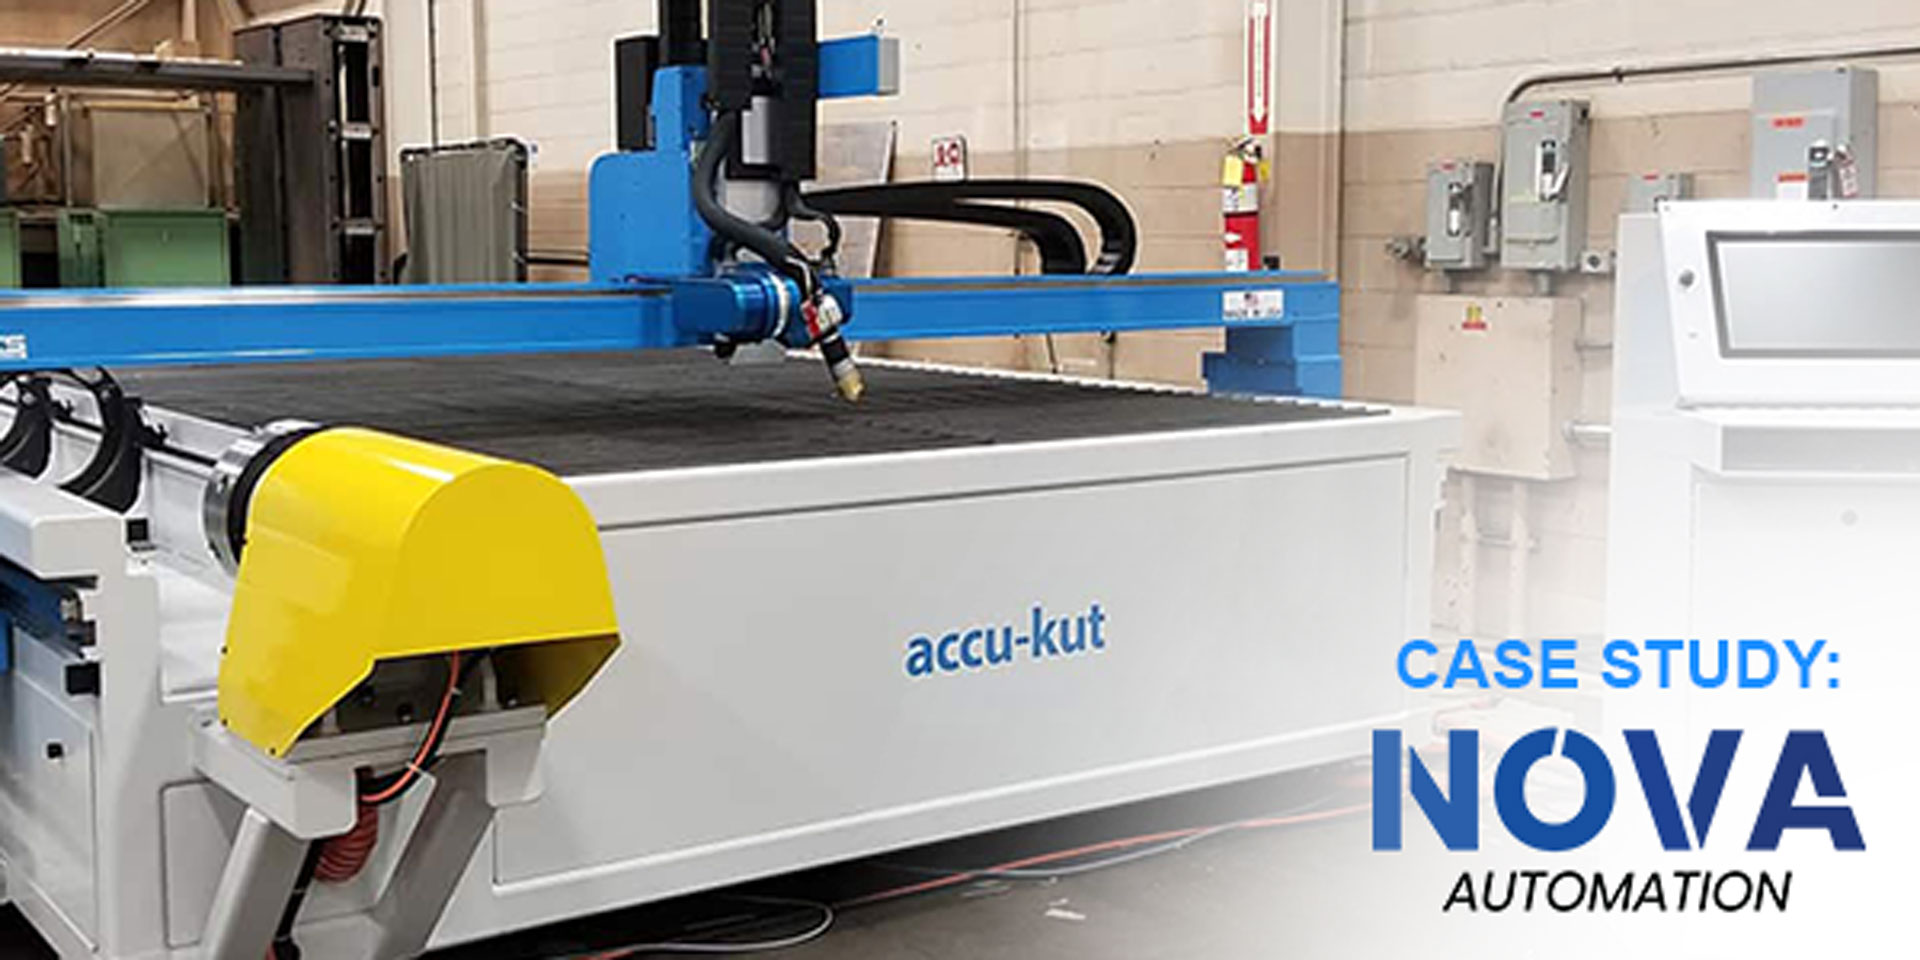 nova automation aks cutting